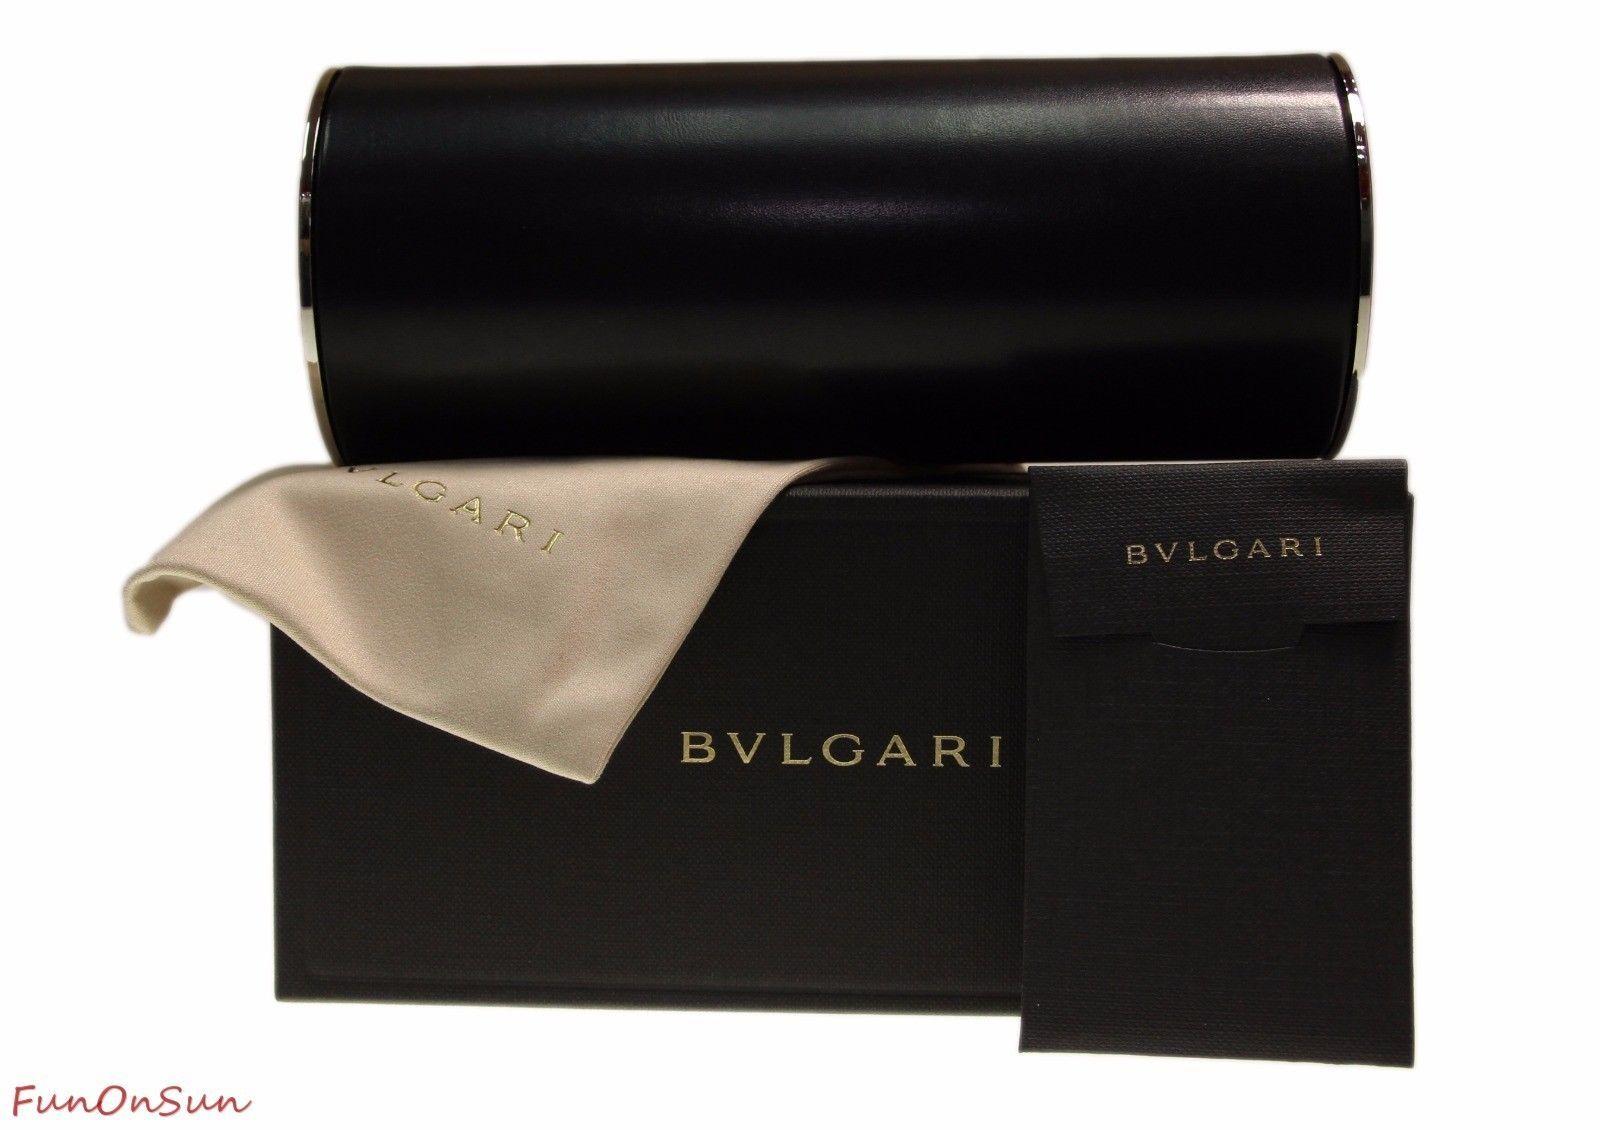 BVLGARI Round Women's Sunglasses BV6096 20321A Matte Plum/Violet Lens 58mm